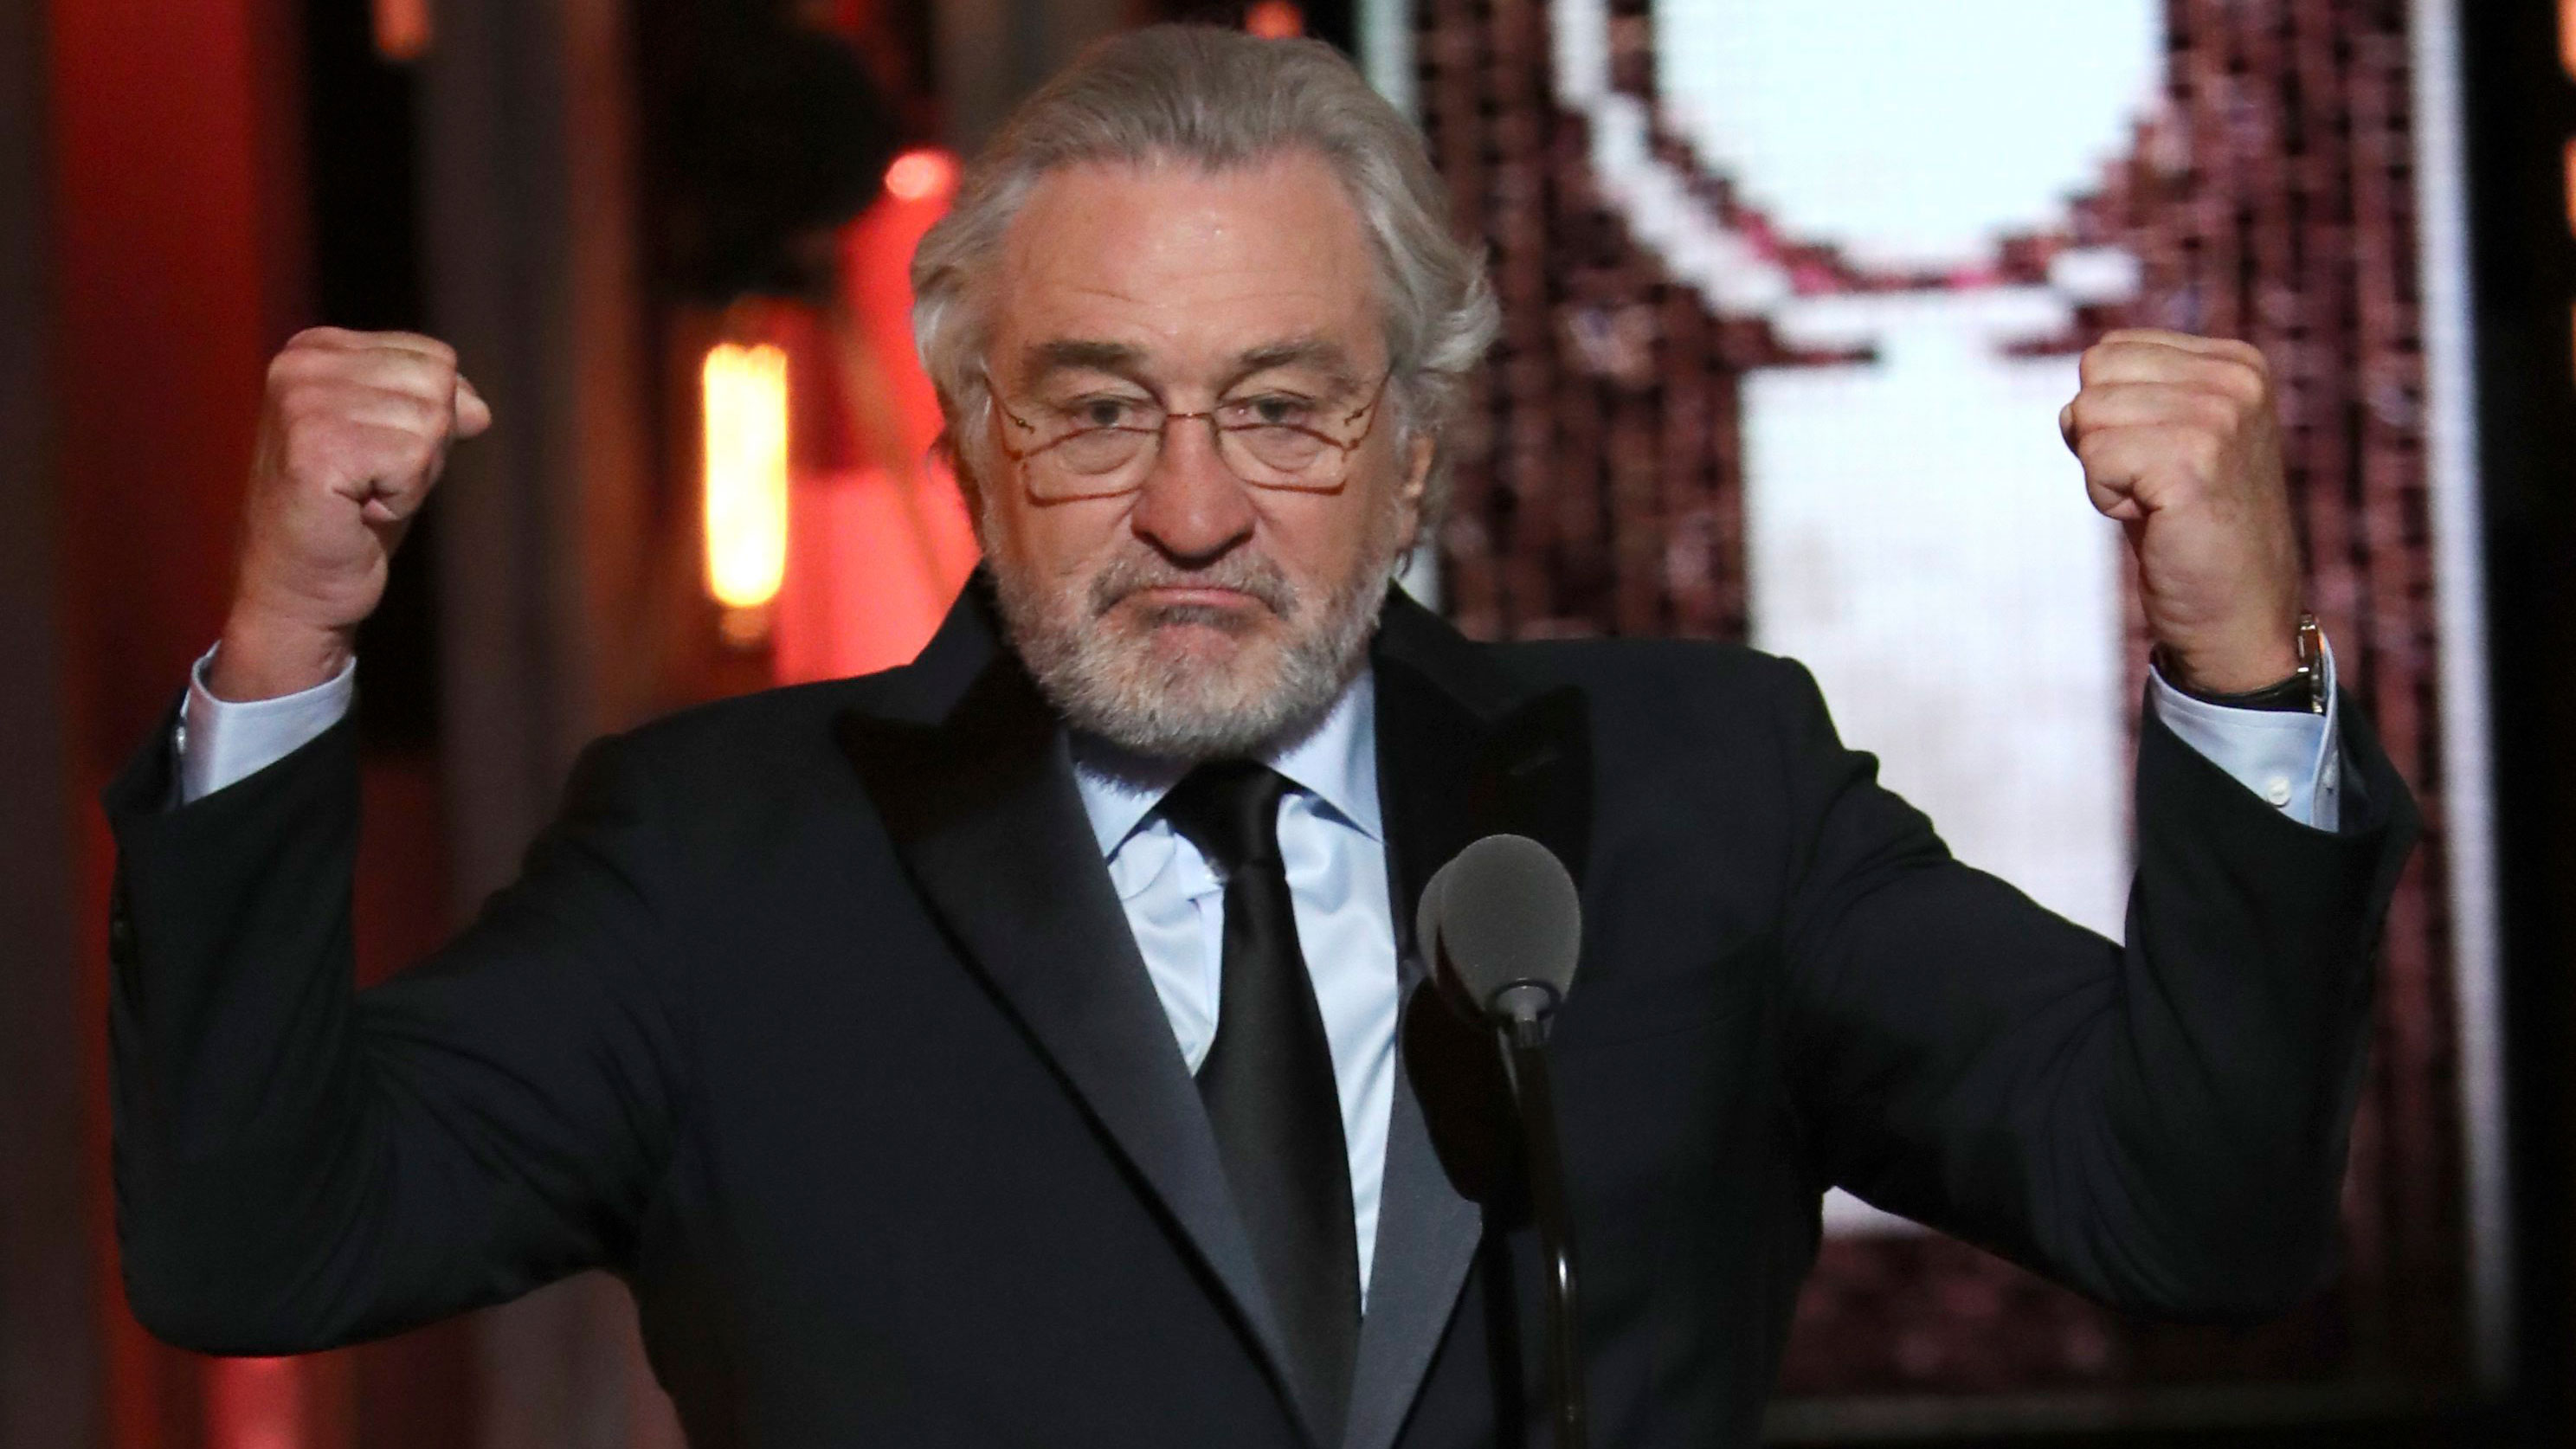 Robert De Niro says 'F